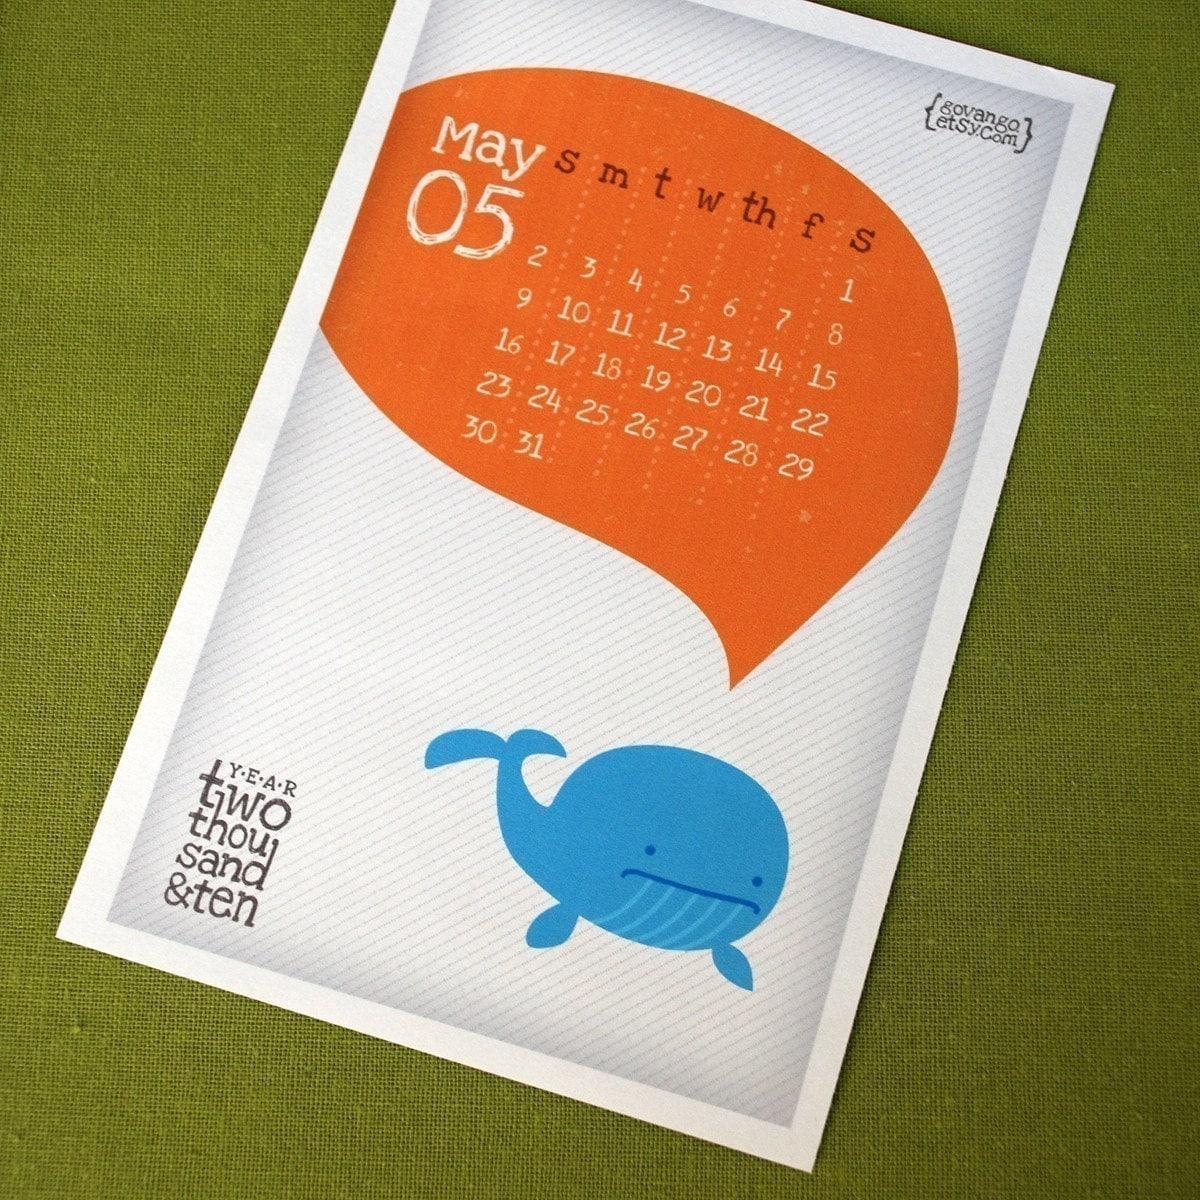 Cute Creatures Calendar 2010 2011 Printable Digital PDF Kawaii Yearly Month